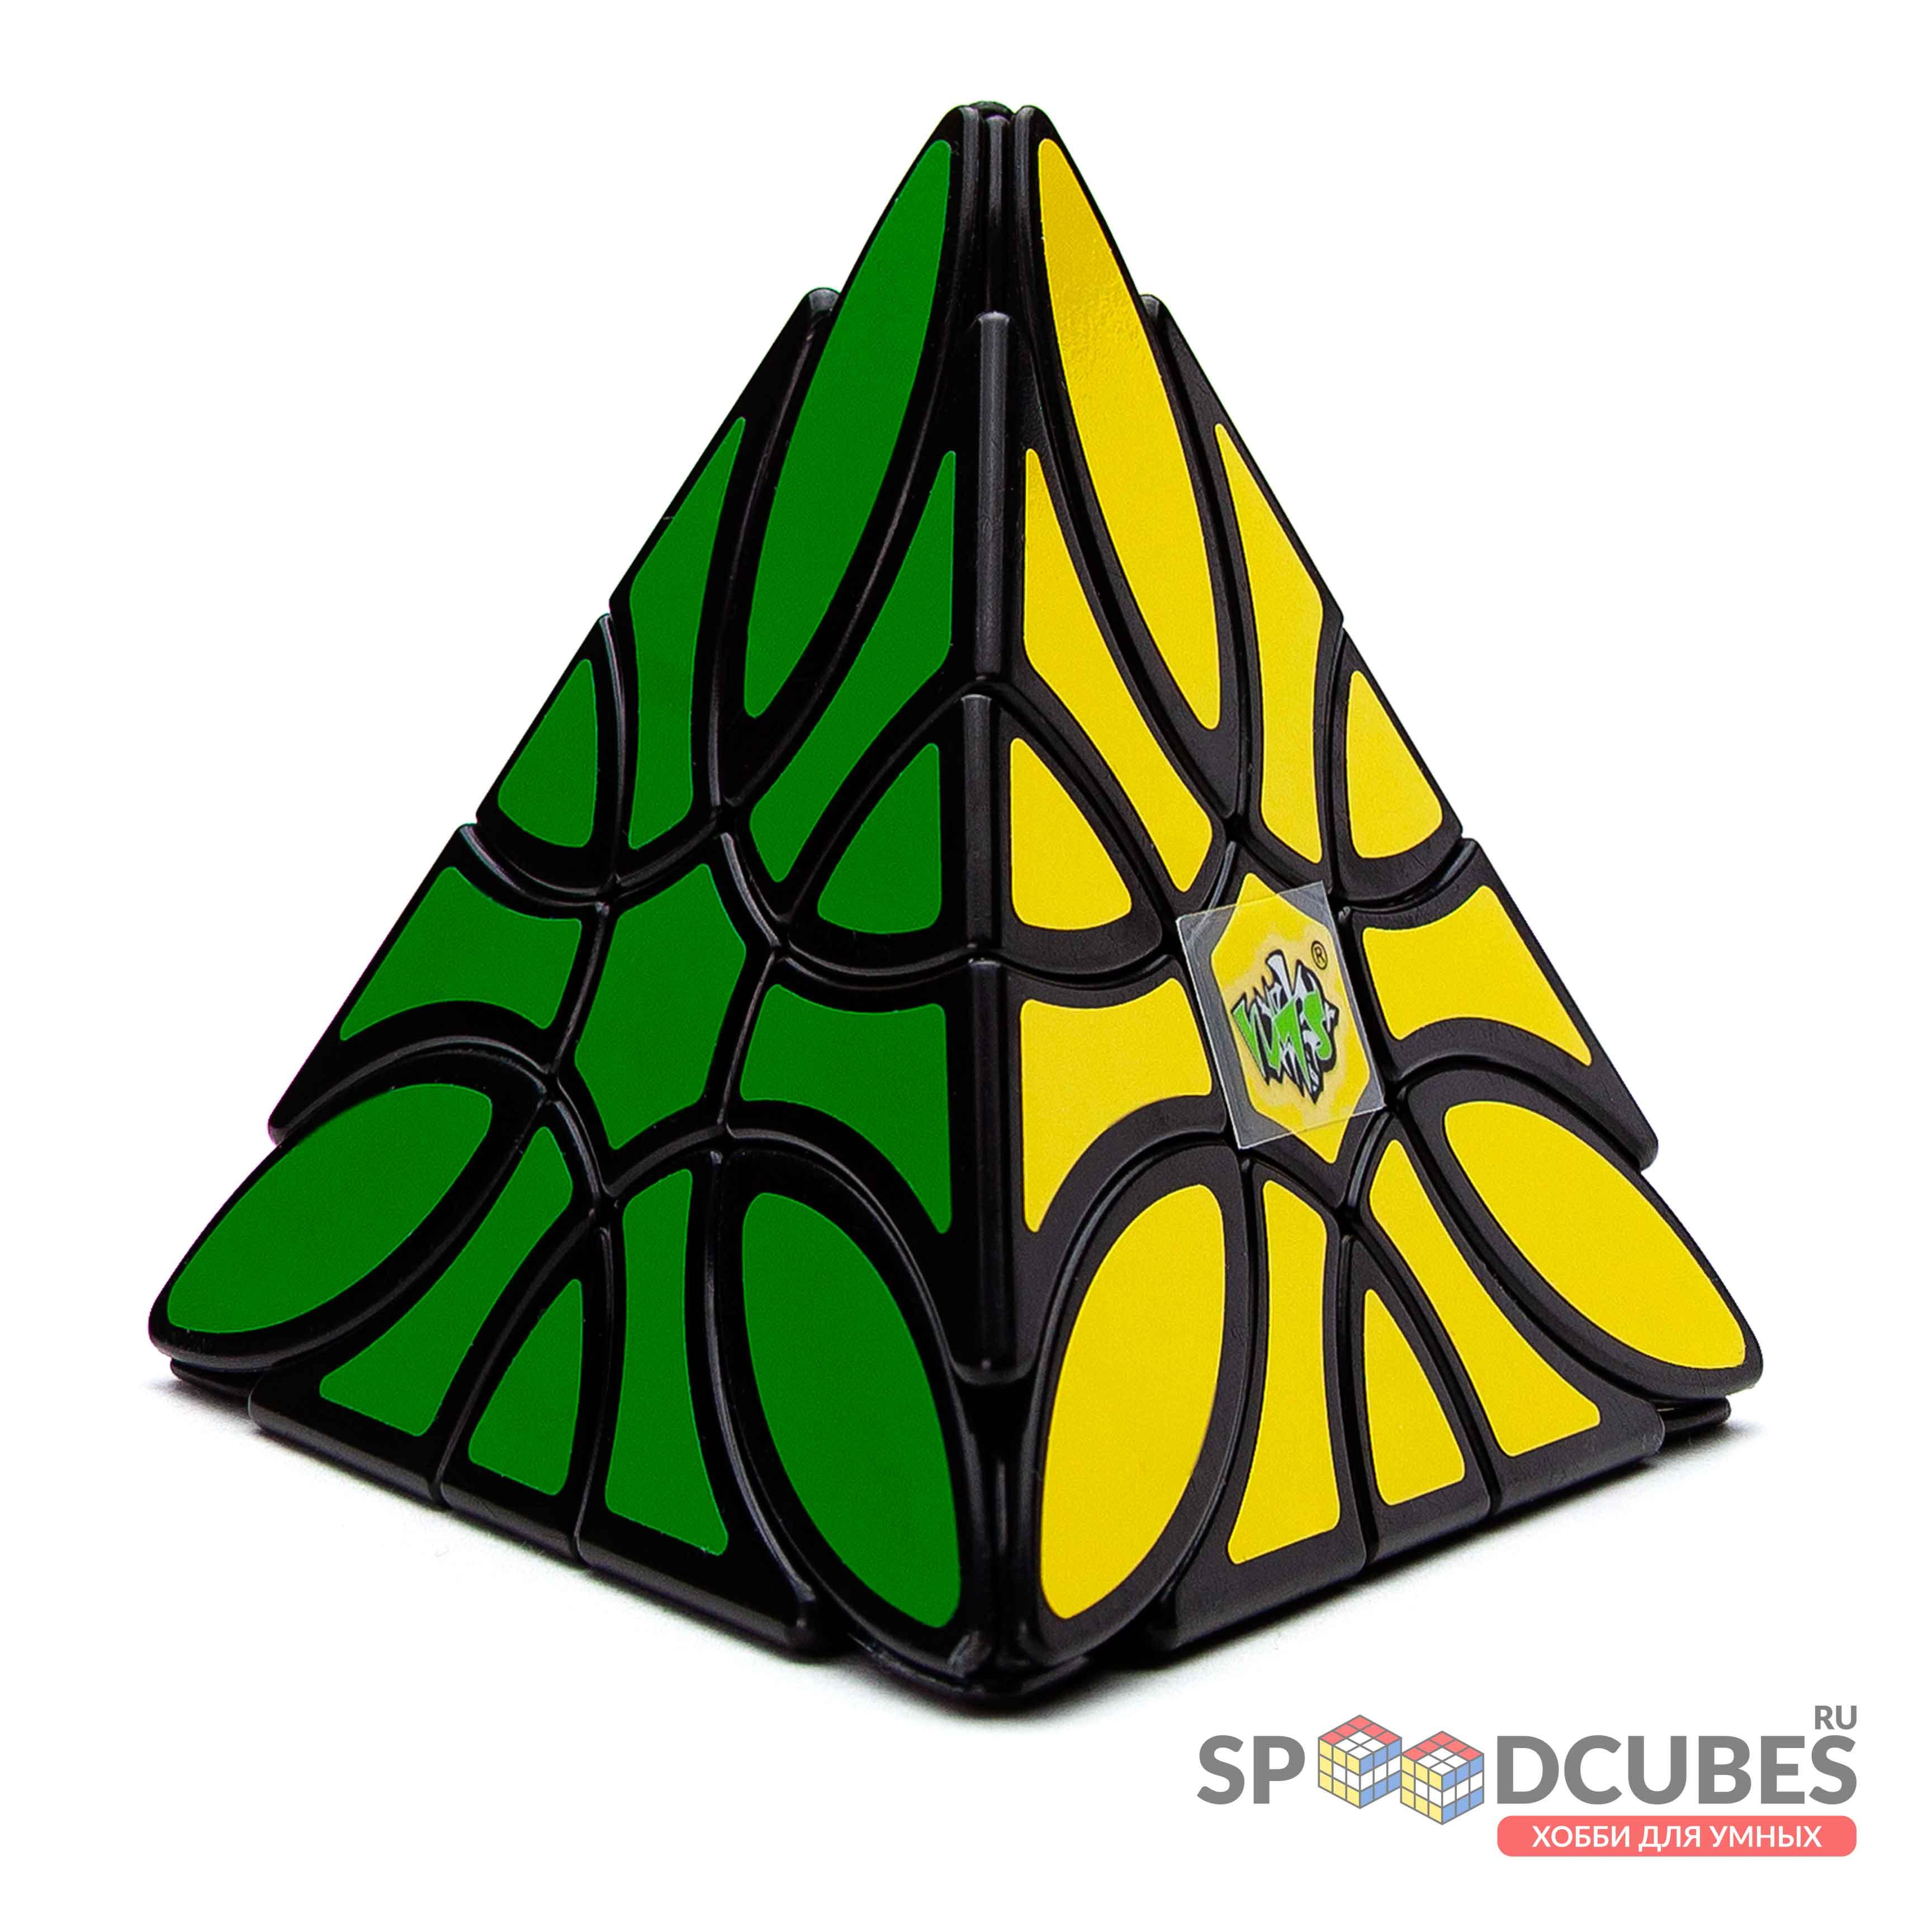 Lanlan Curvy Clover Pyraminx